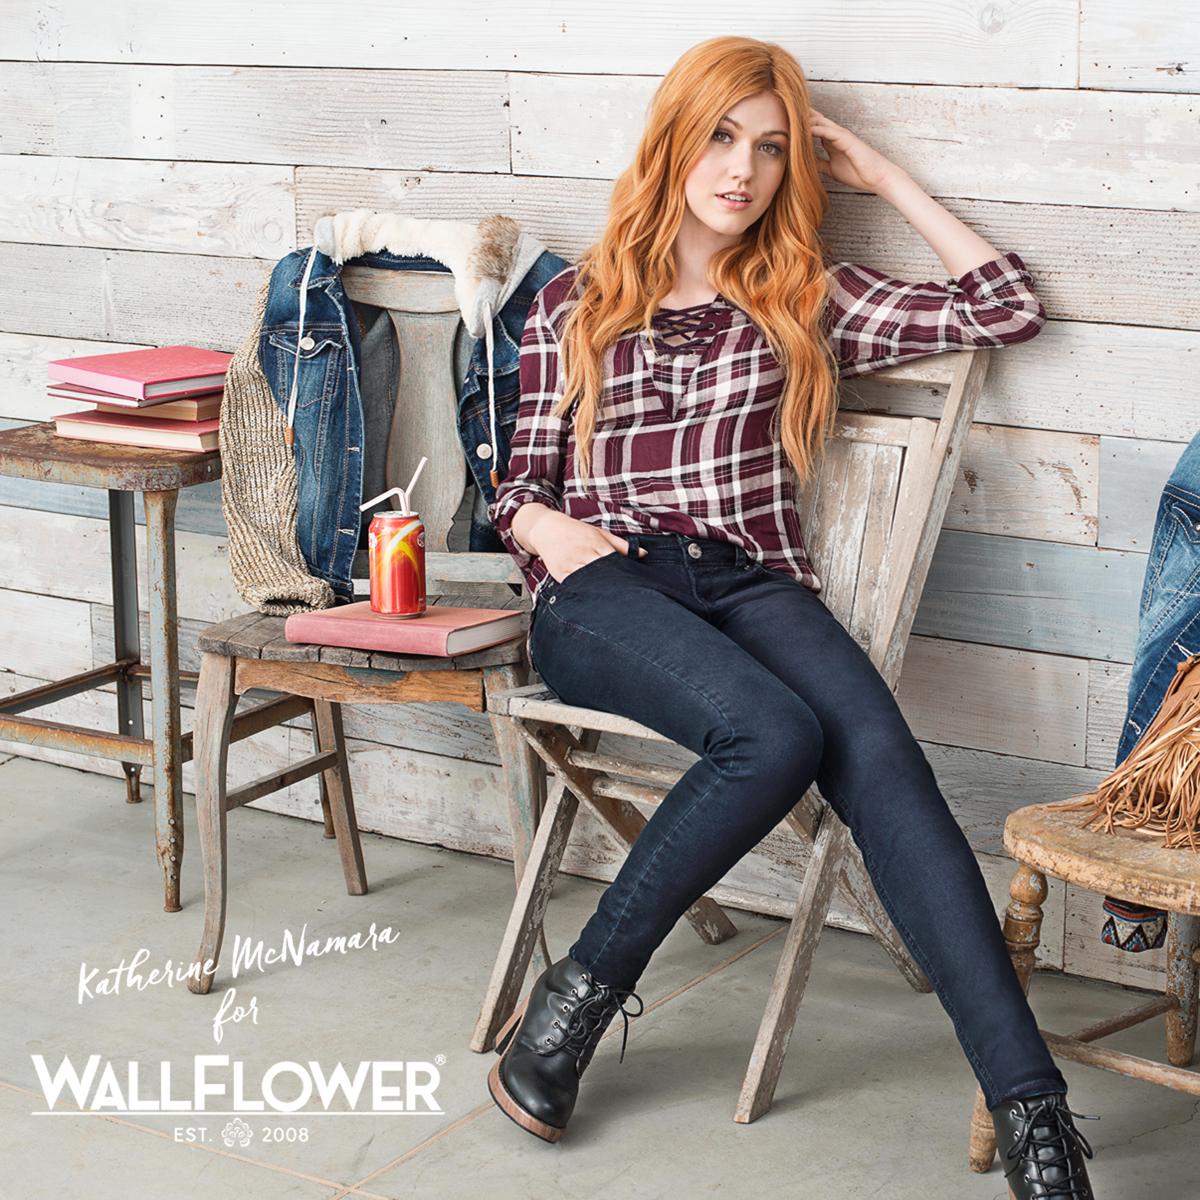 WALLFLOWER CROPPED IMAGE_4X4.jpg